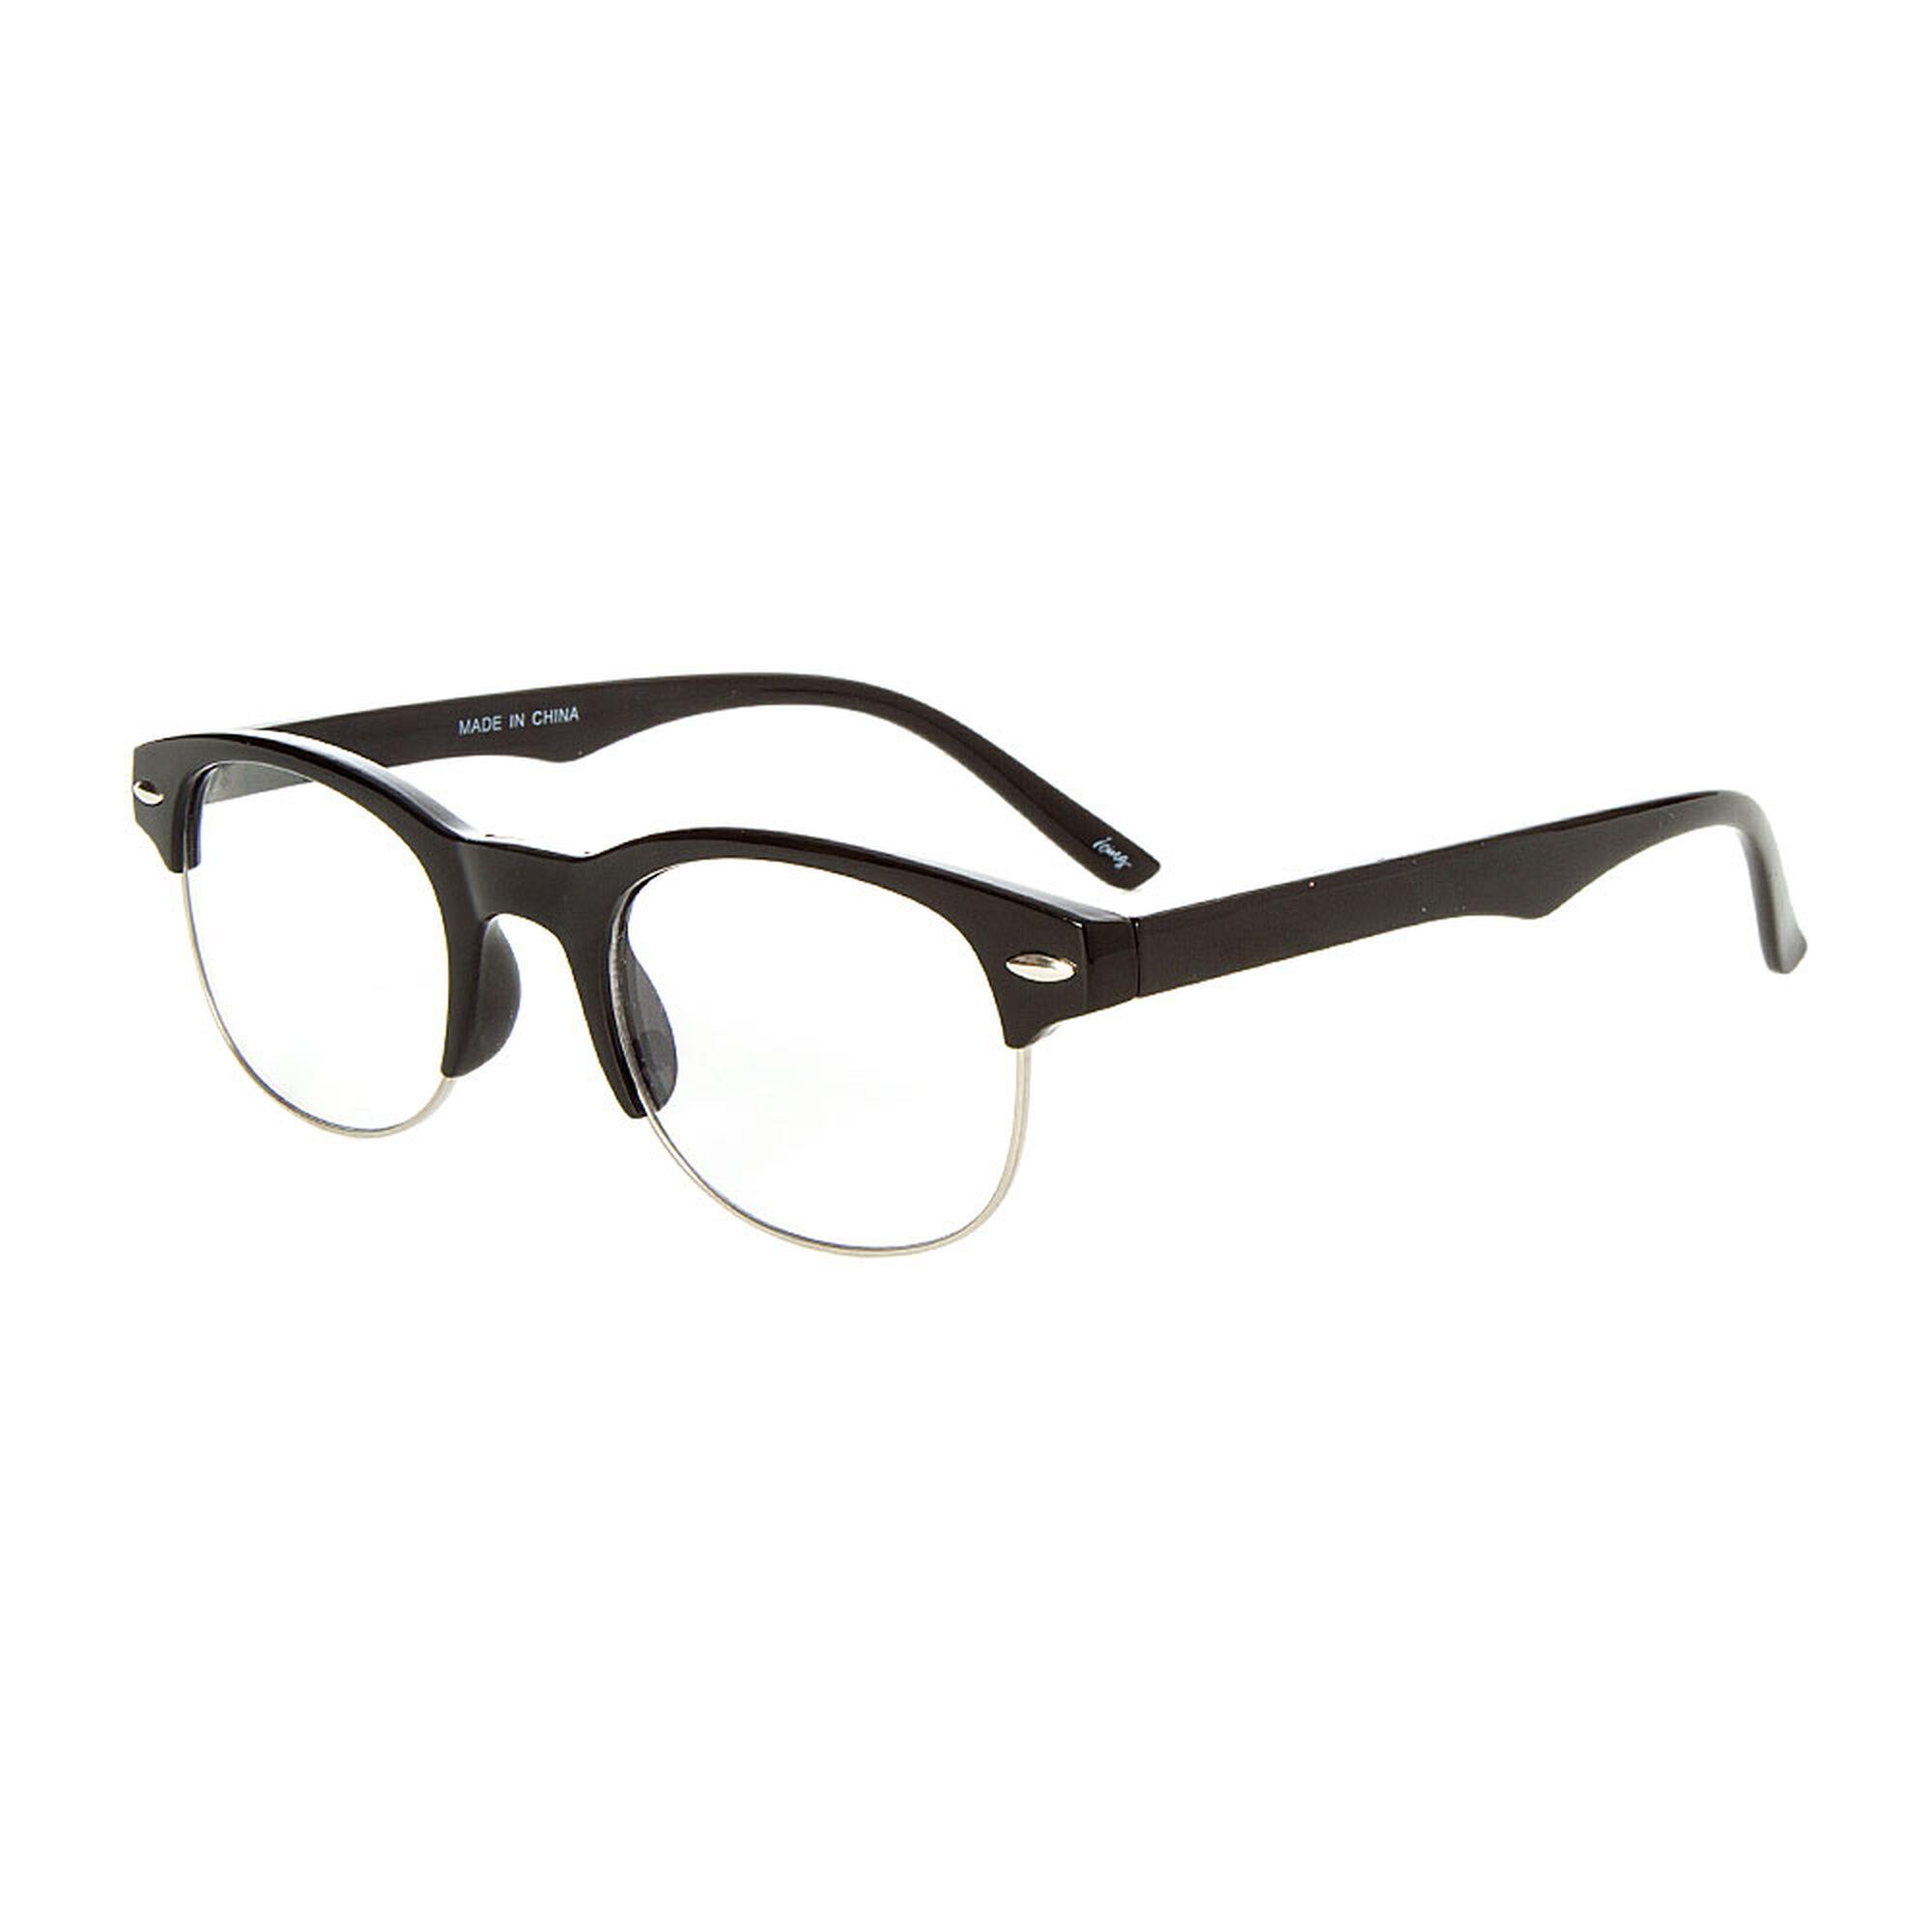 Black Half Frame Fashion Glasses | Icing US